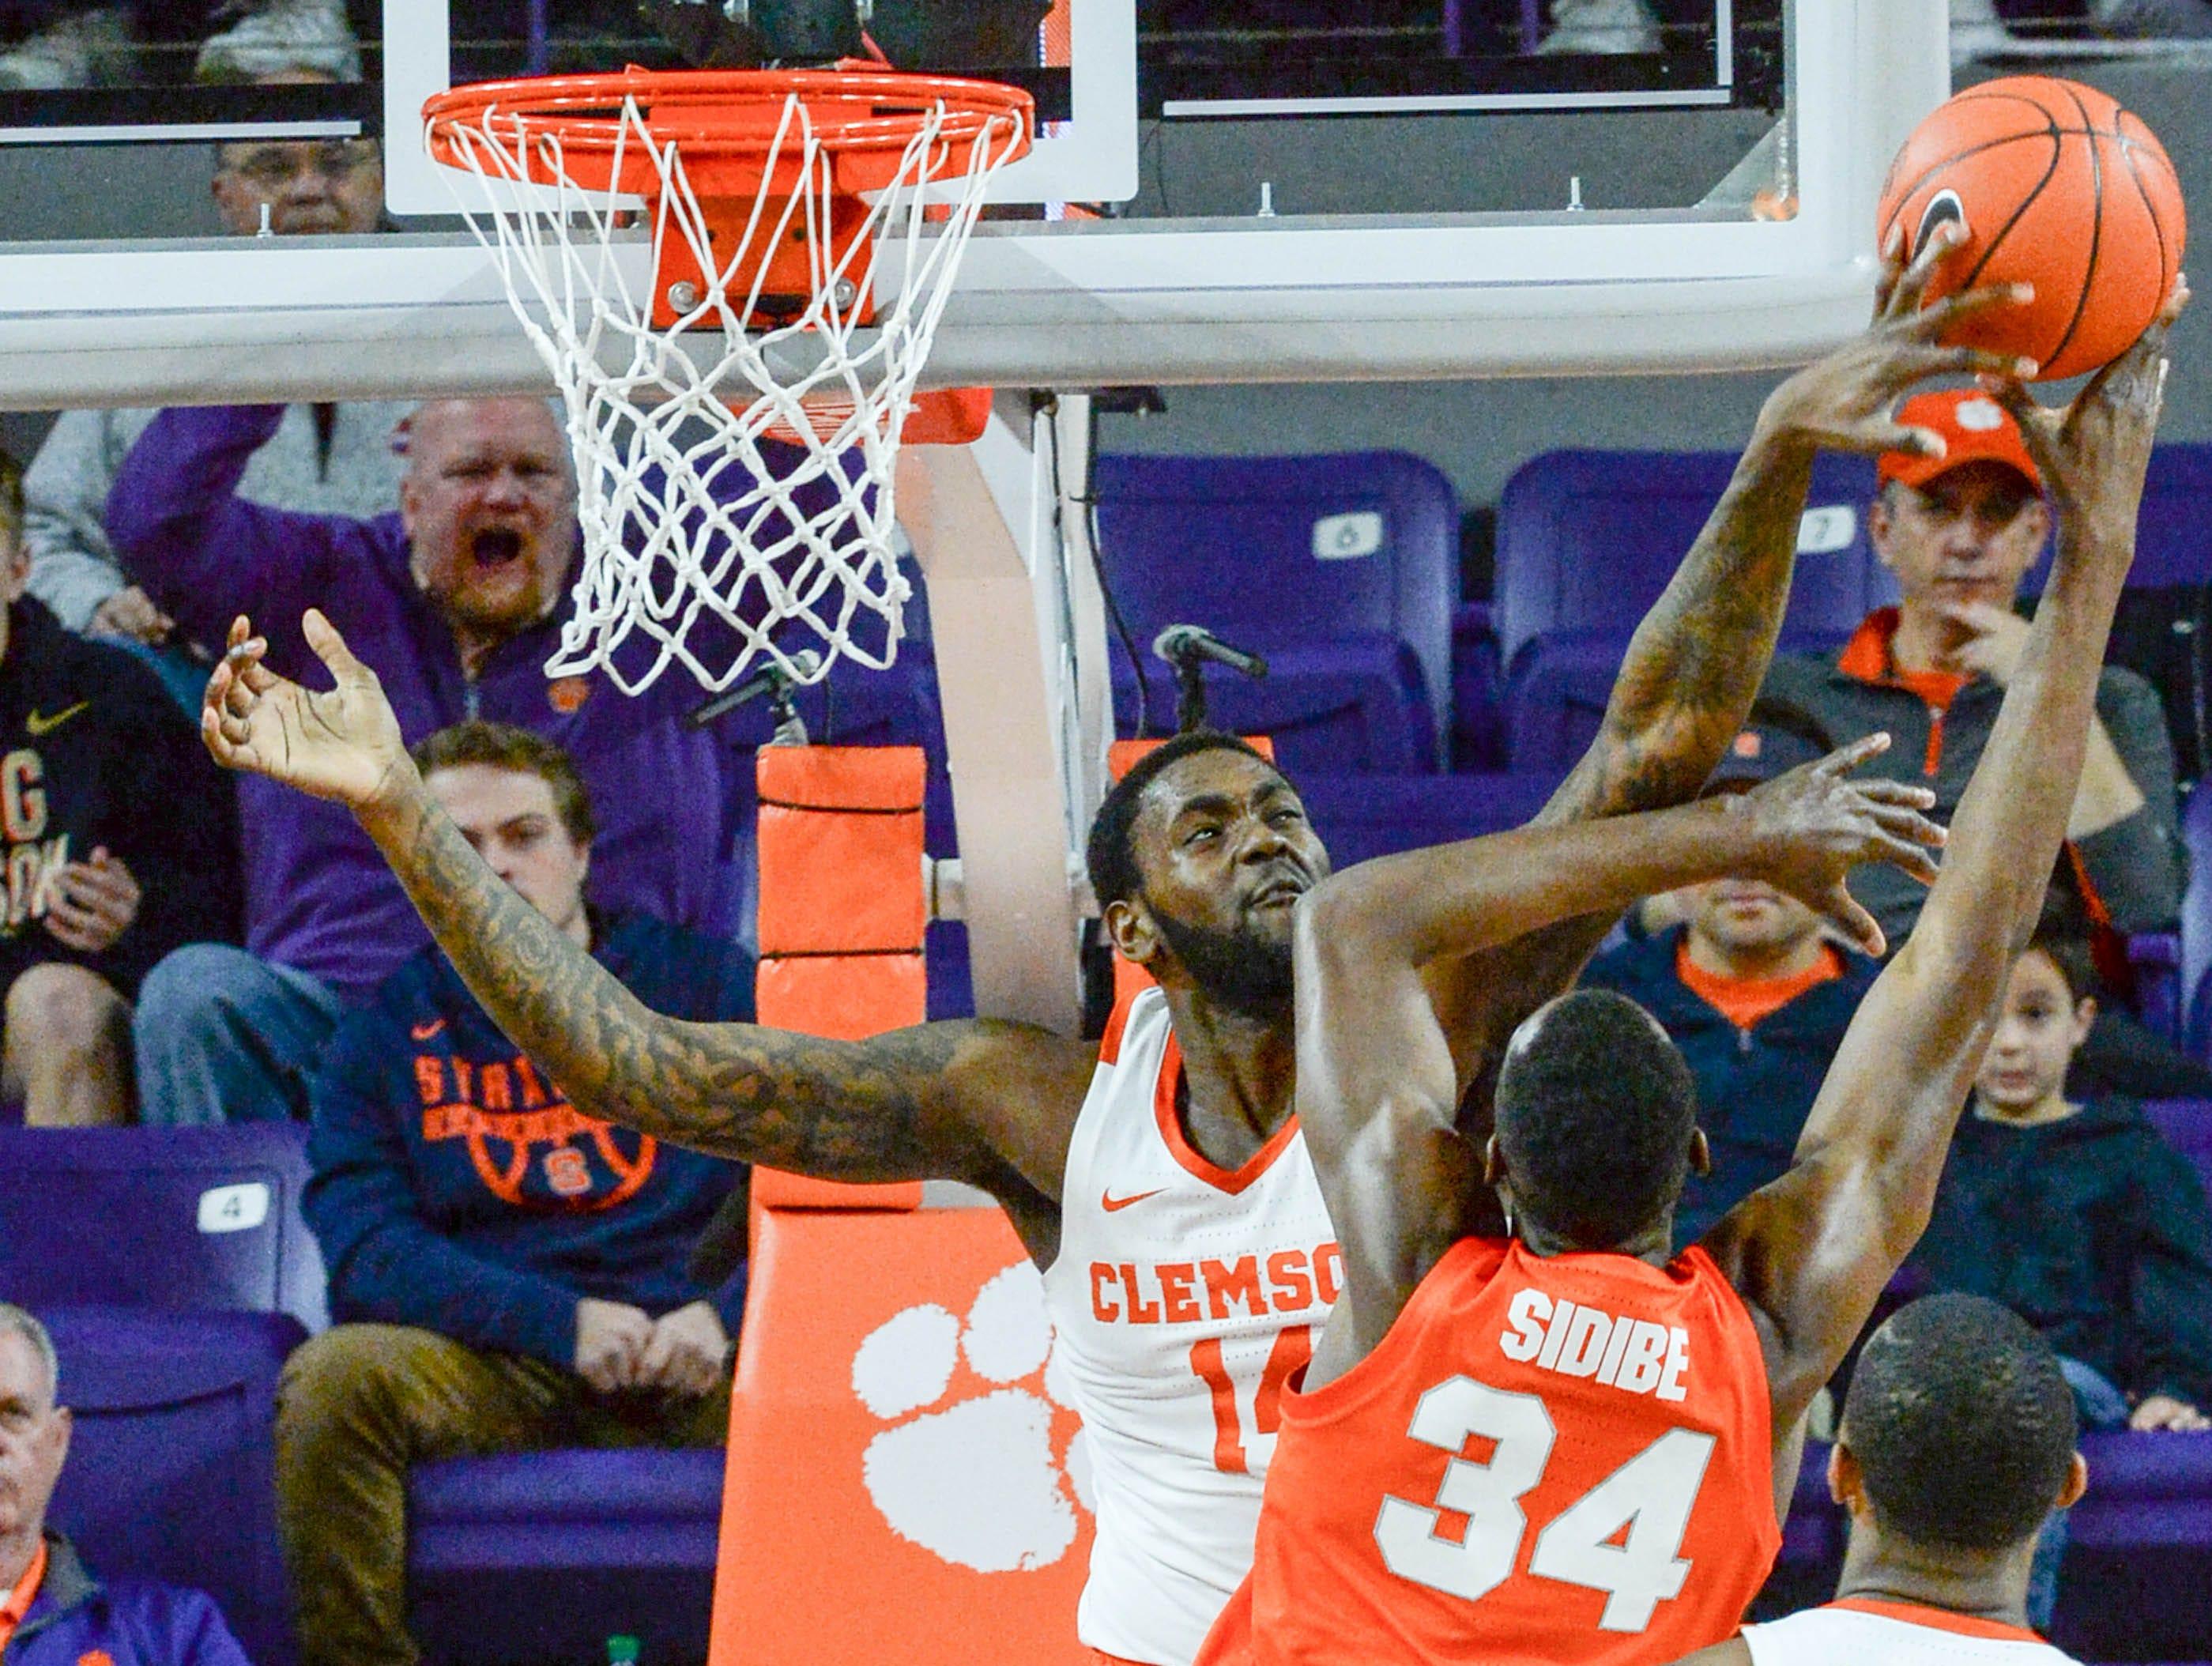 Clemson forward Elijah Thomas (14) blocks the shot of Syracuse forward Bourama Sidibe(34) during the first half at Littlejohn Coliseum in Clemson Saturday, March 9, 2019.